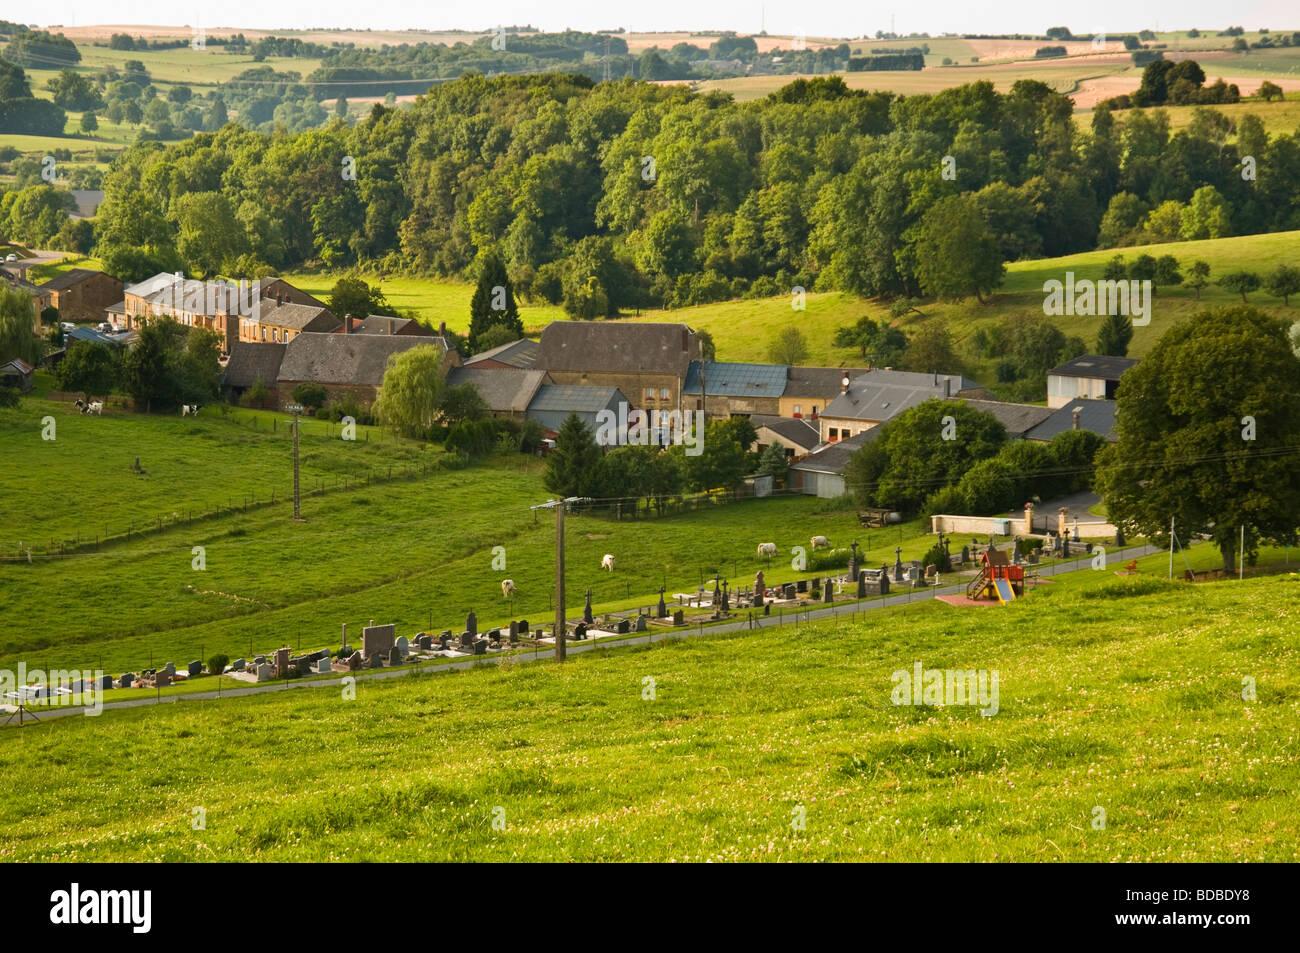 French village Vaux-Villaine, Ardennes, France, 08 - Stock Image